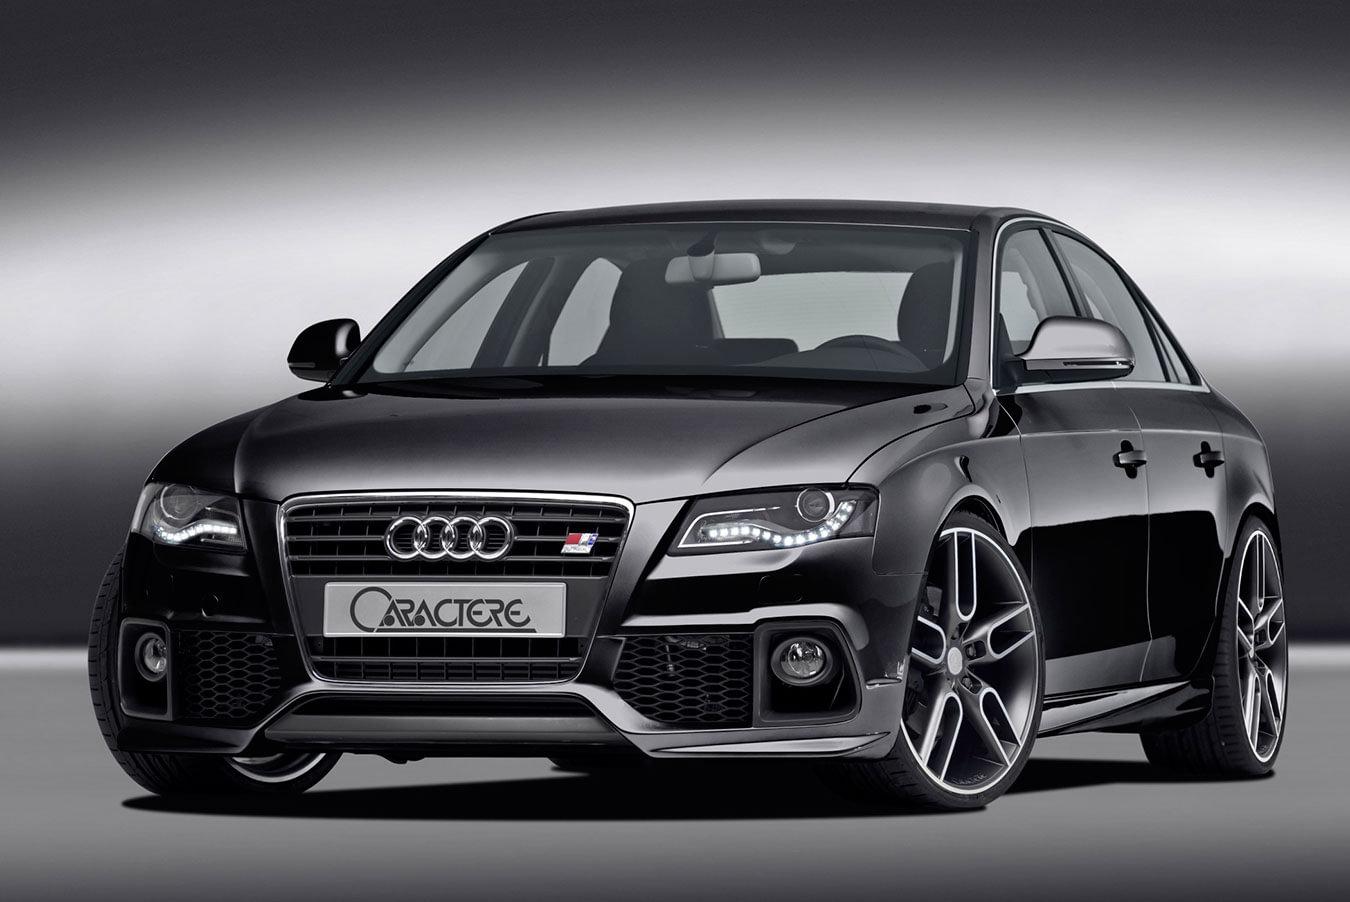 Audi S4 B8.0 (2009-2012)